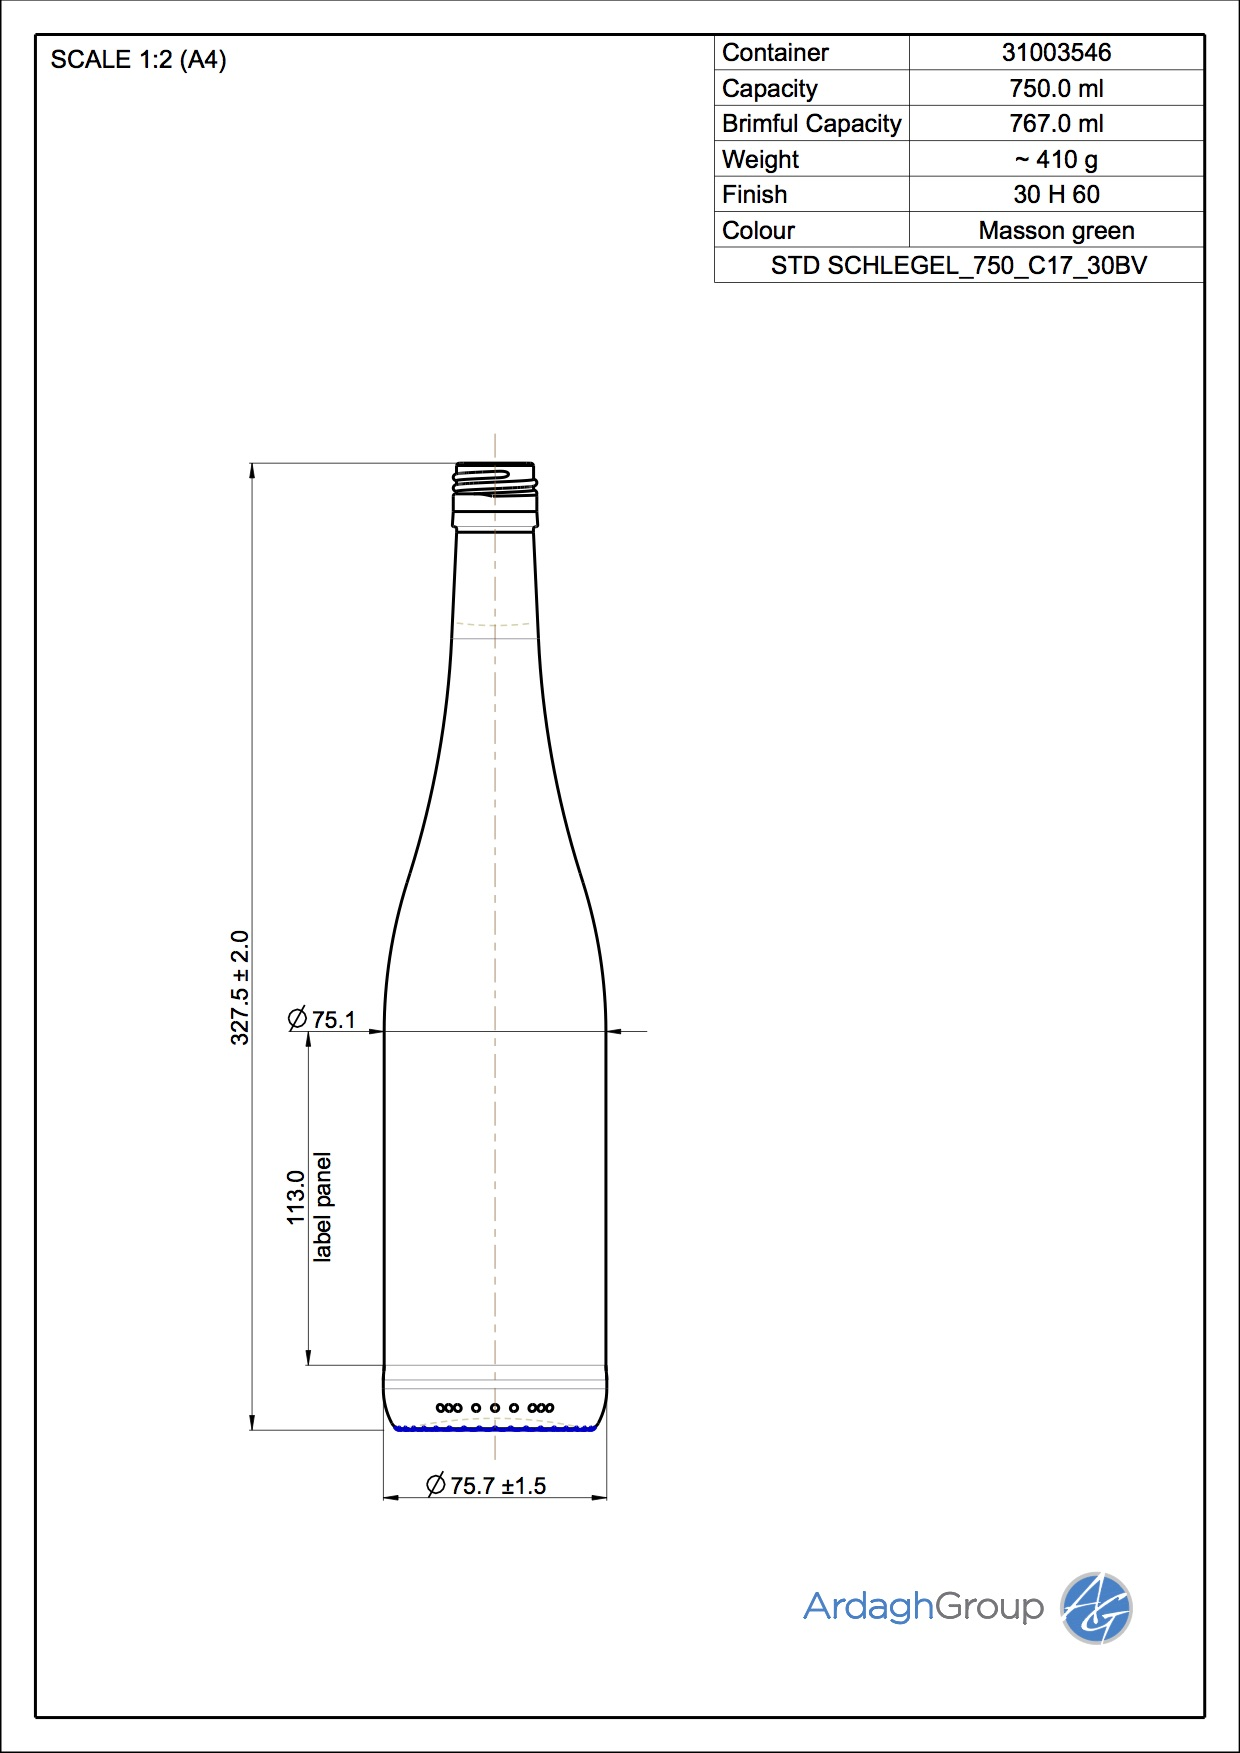 STD SCHLEGEL_750_C17_30BV